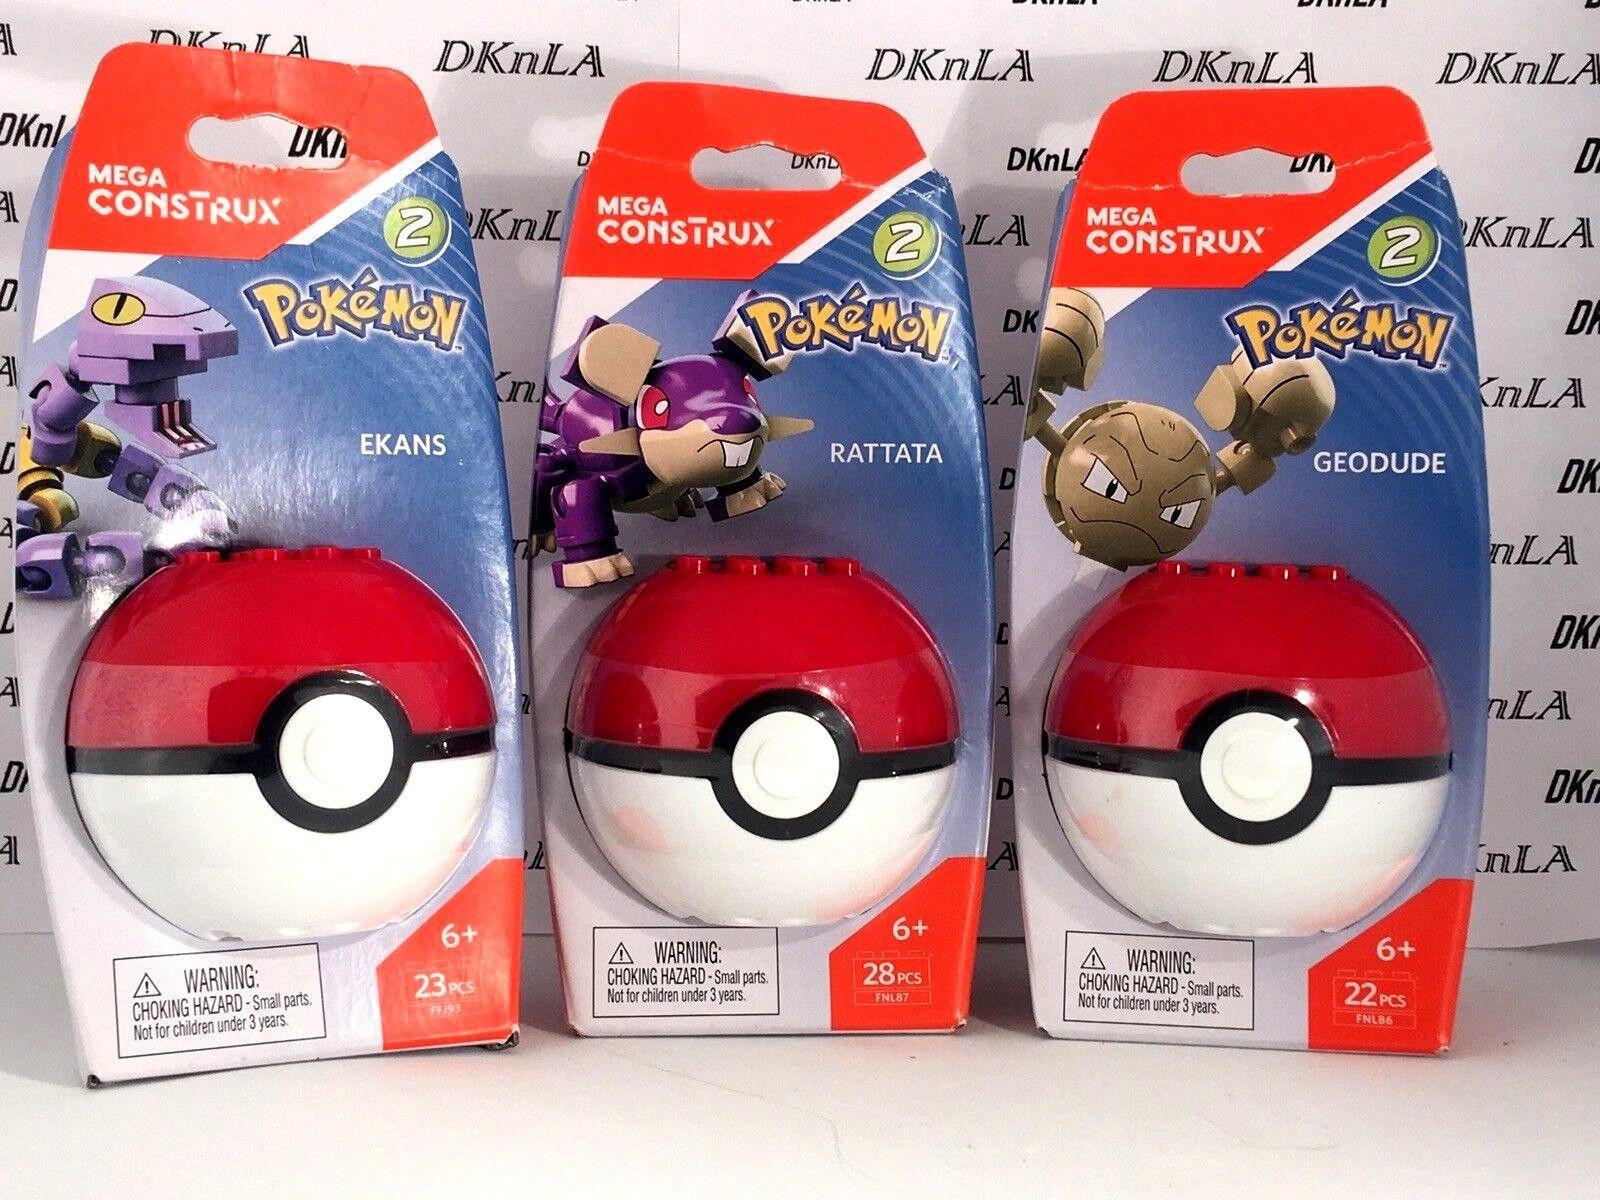 Lot of of of 3 - Mega Construx Pokemon Pokeball Series 2 - Ekans, Rattata & Geodude 93a2a4